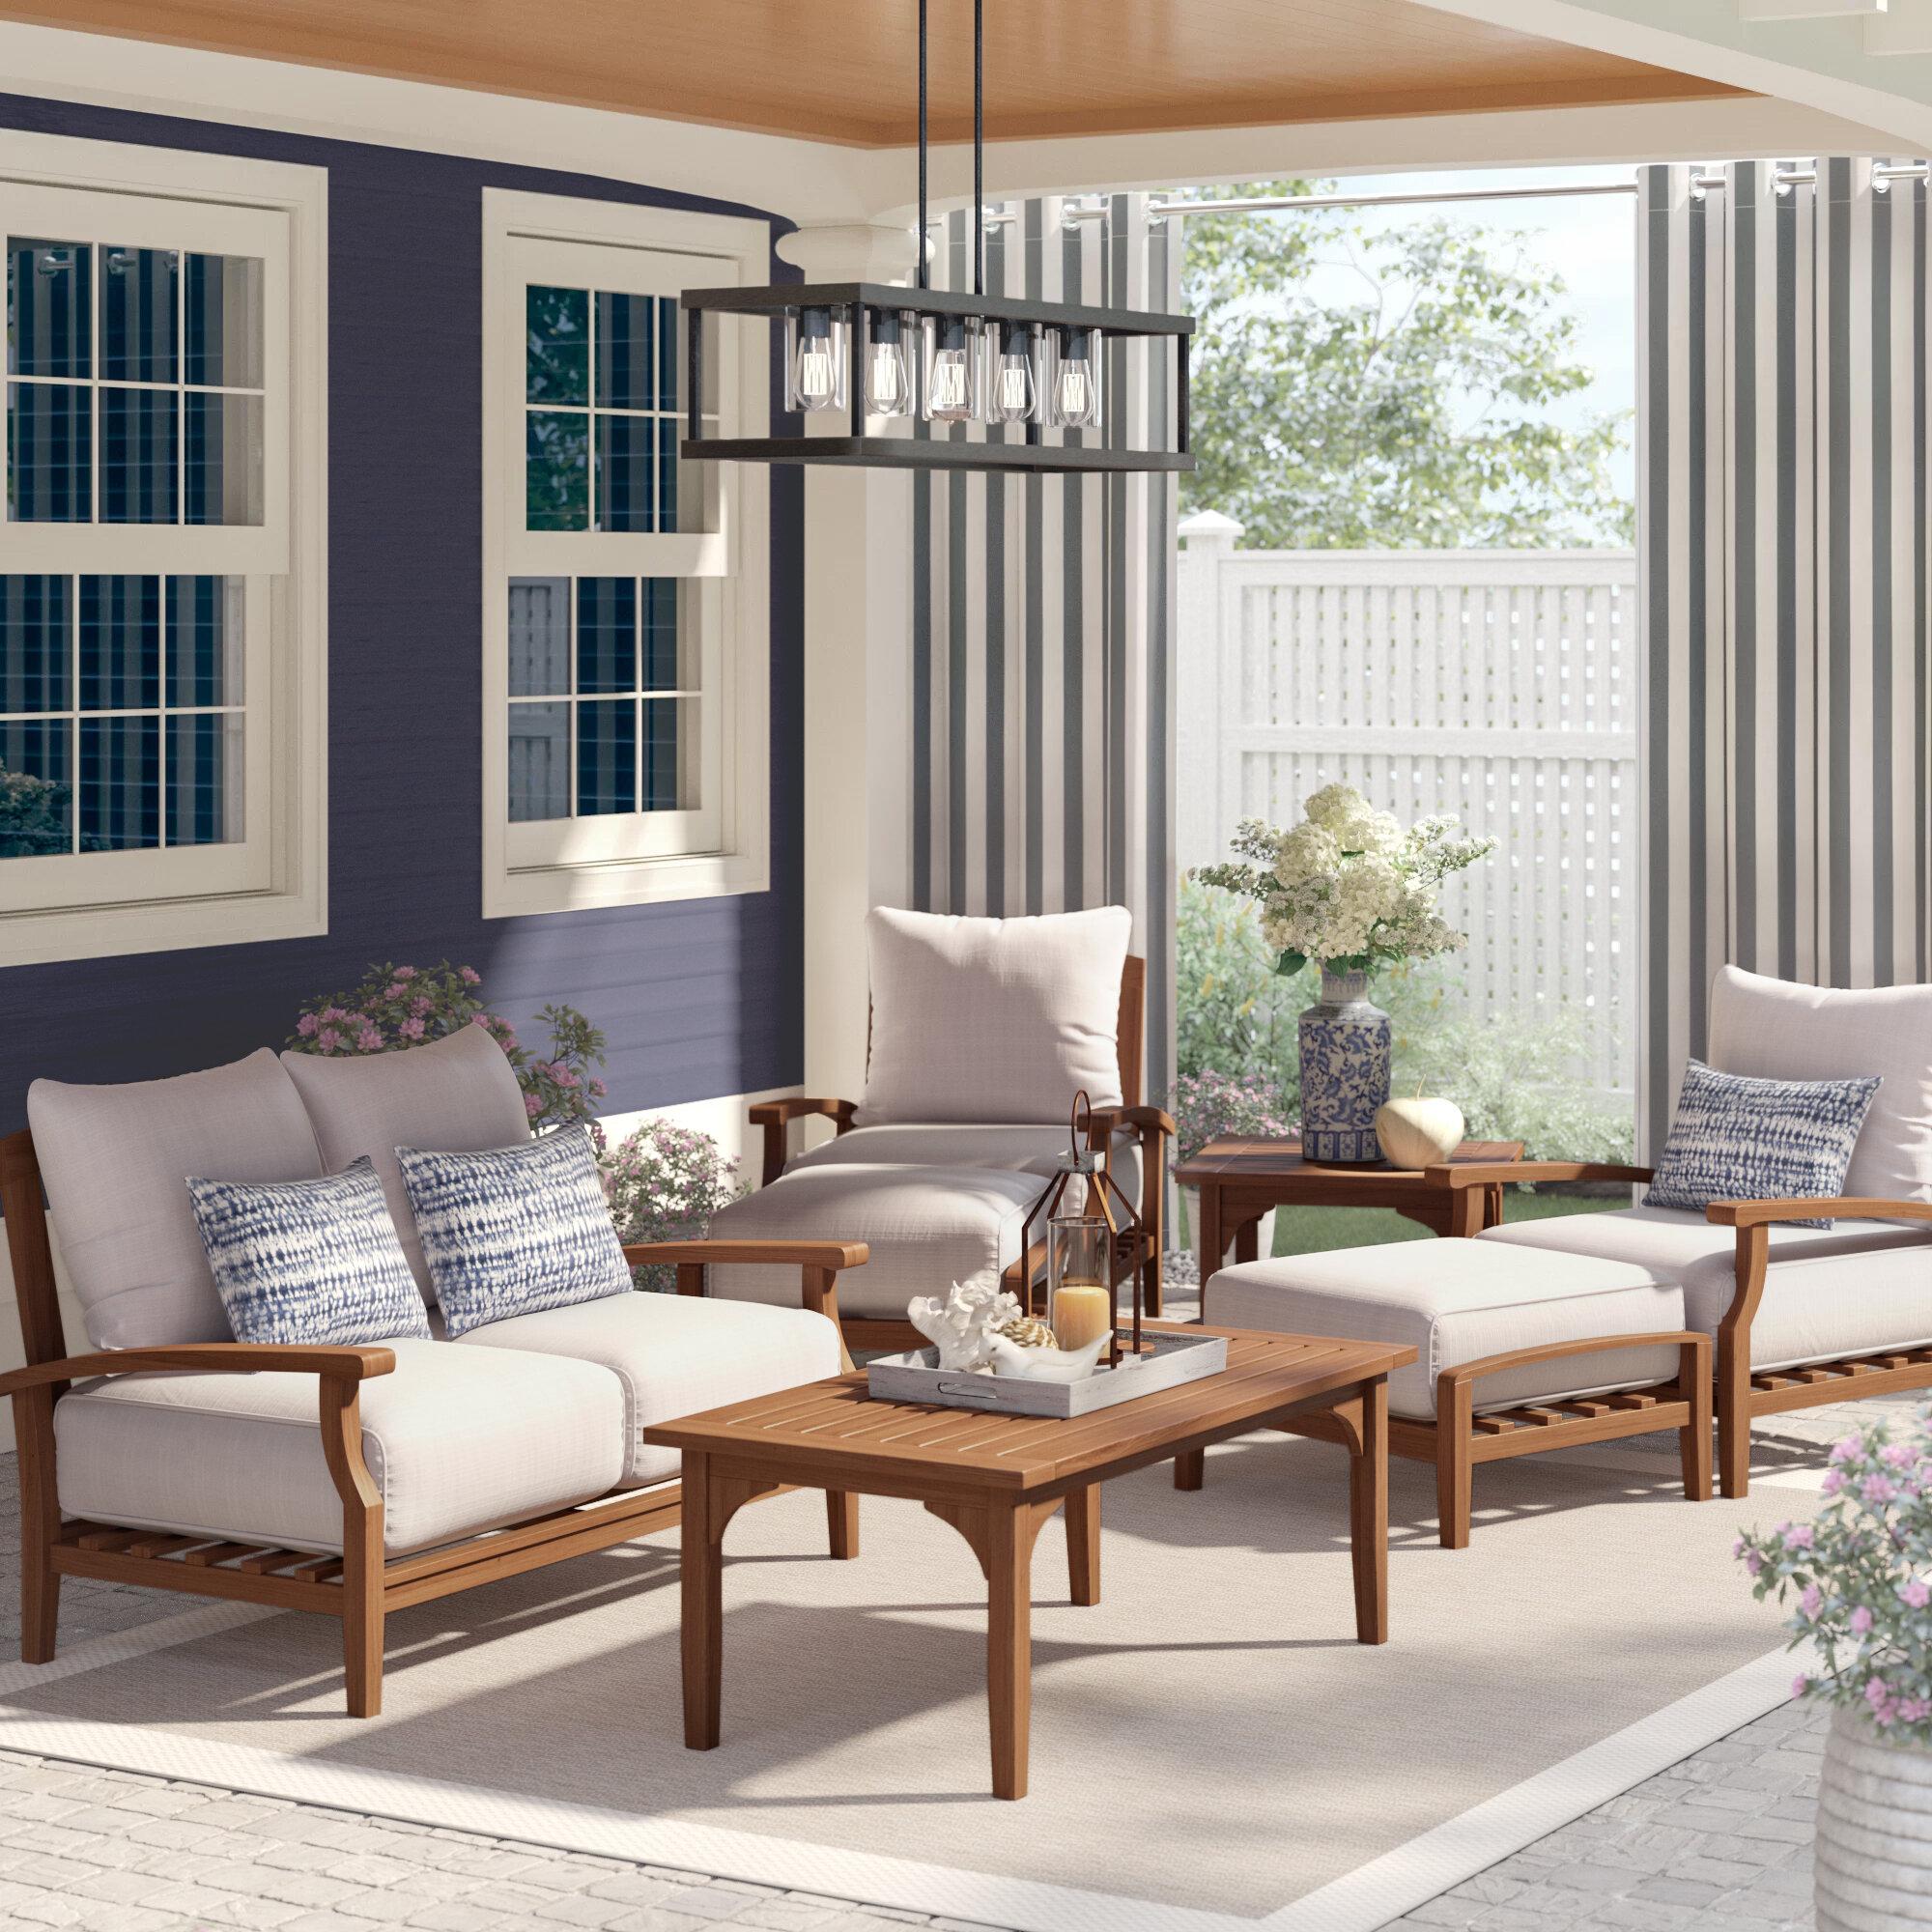 Birch Lane Summerton 7 Piece Teak Sofa Seating Group With Cushions Reviews Wayfair